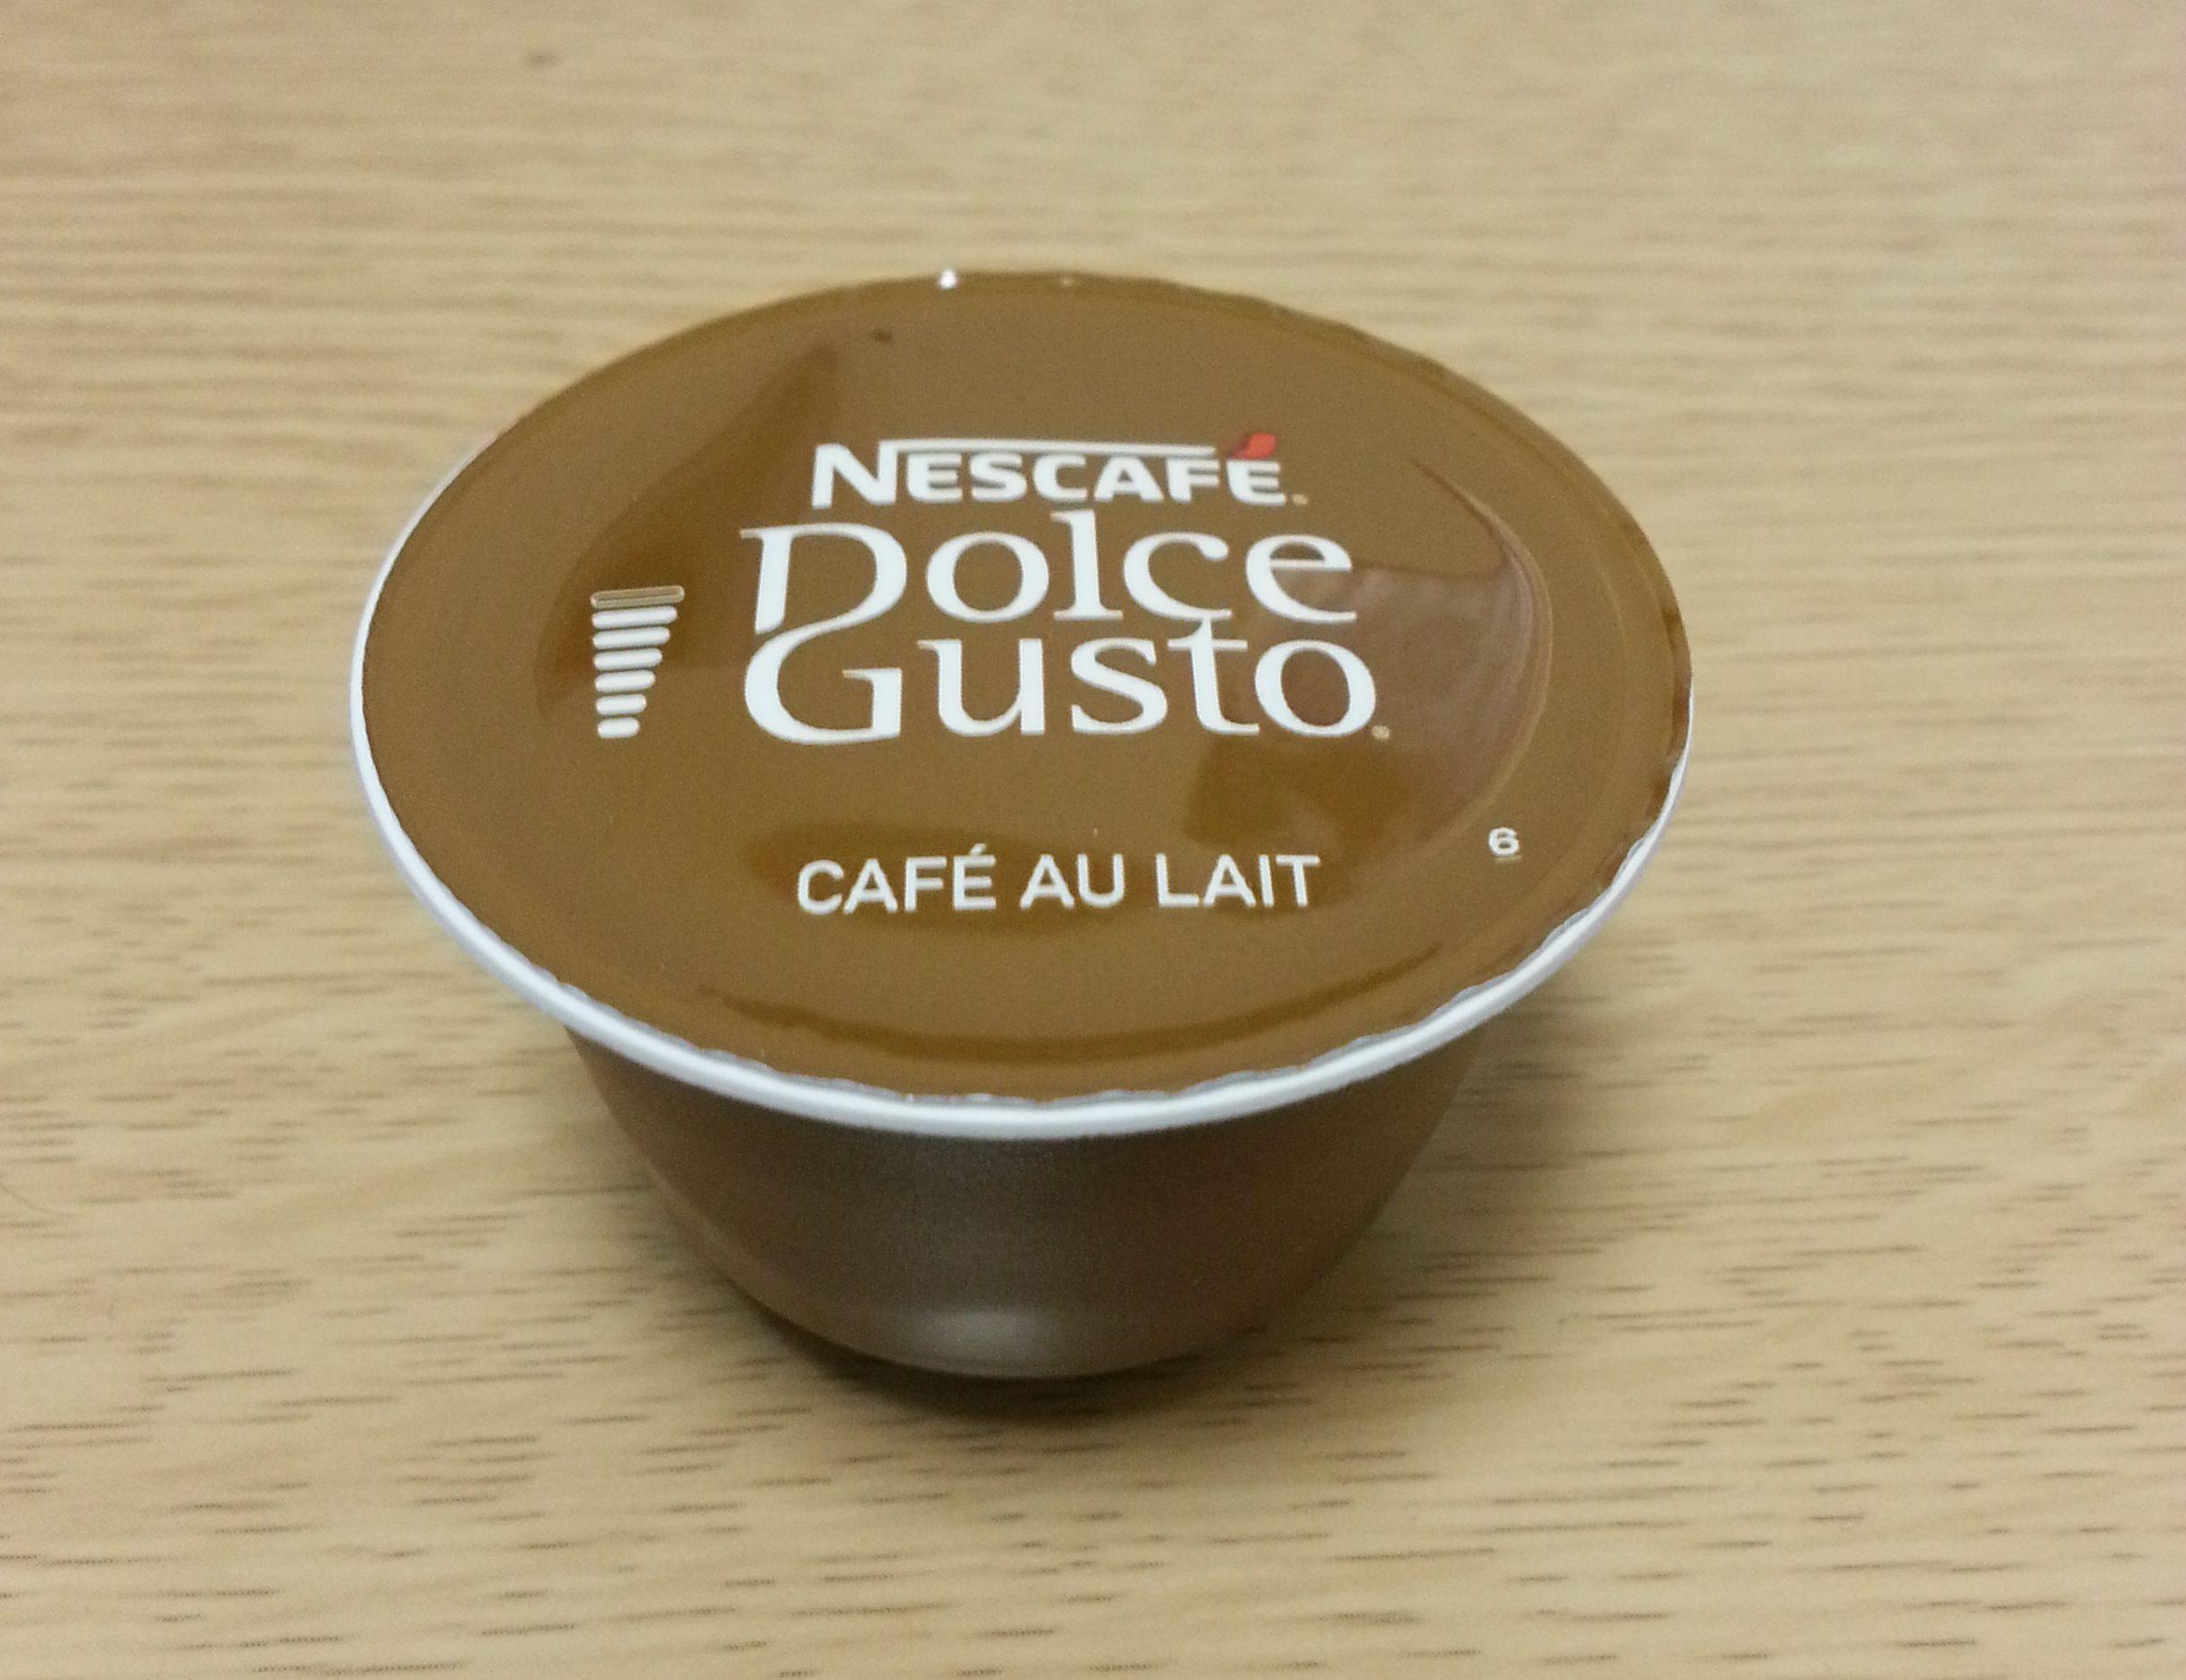 nescafe-dolcegusto-cafeaulait1